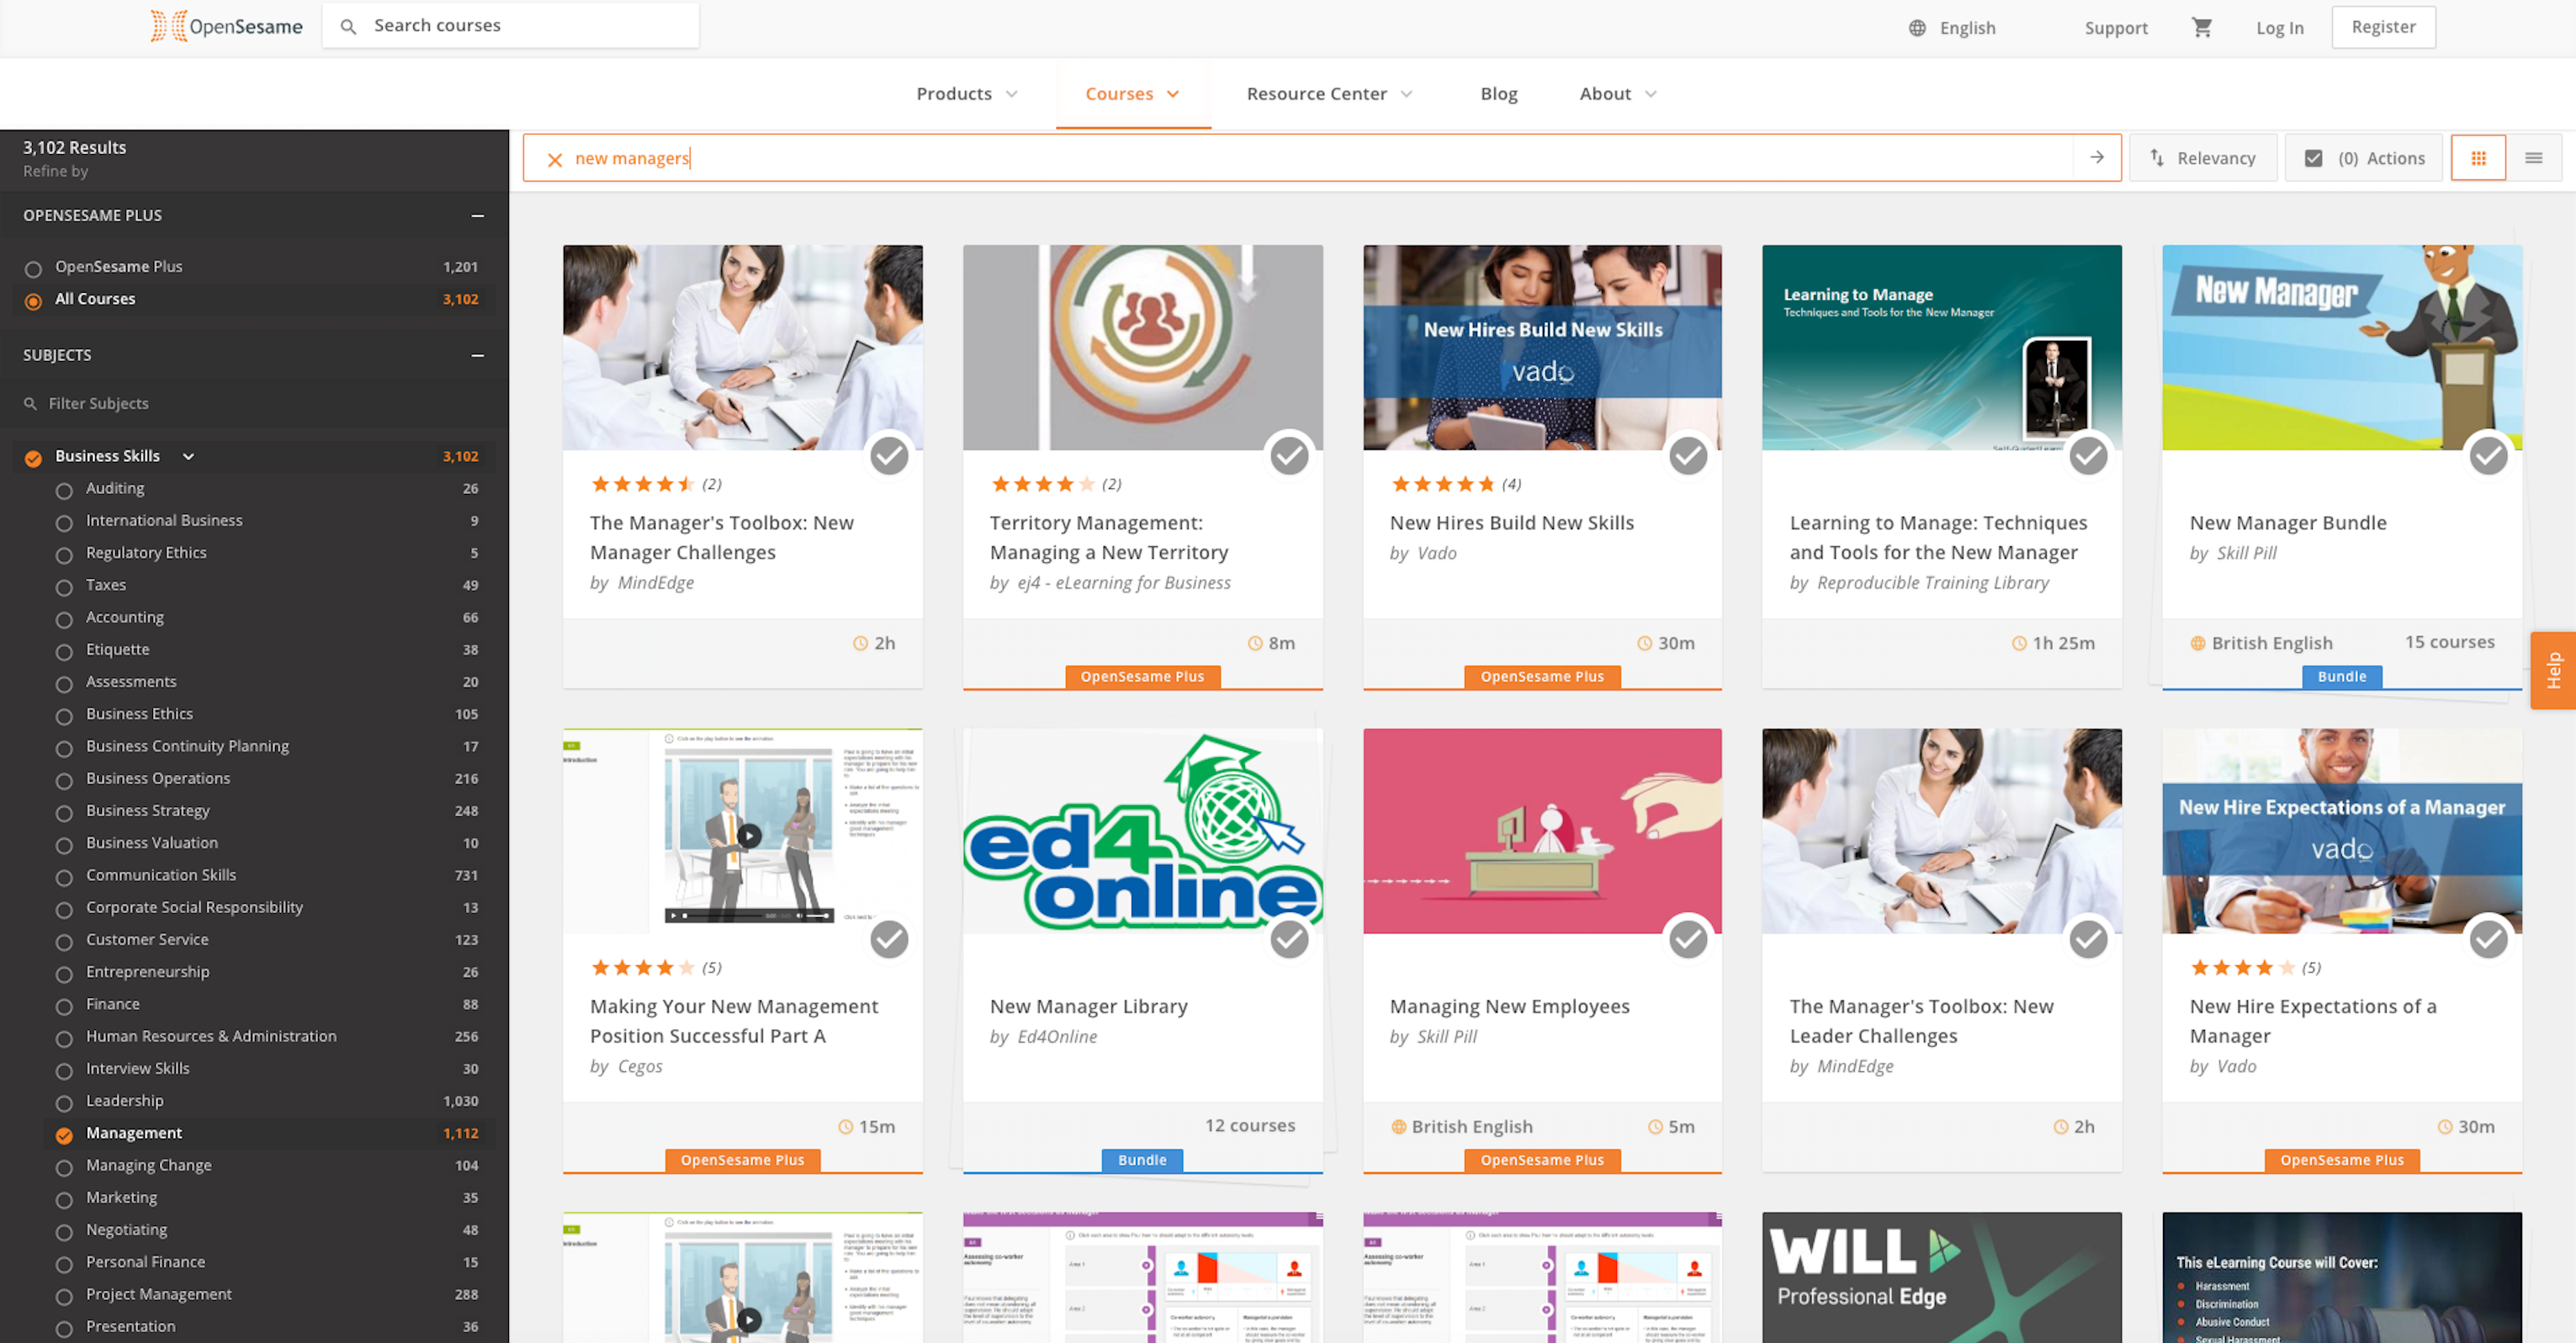 OpenSesame Software - Catalog search